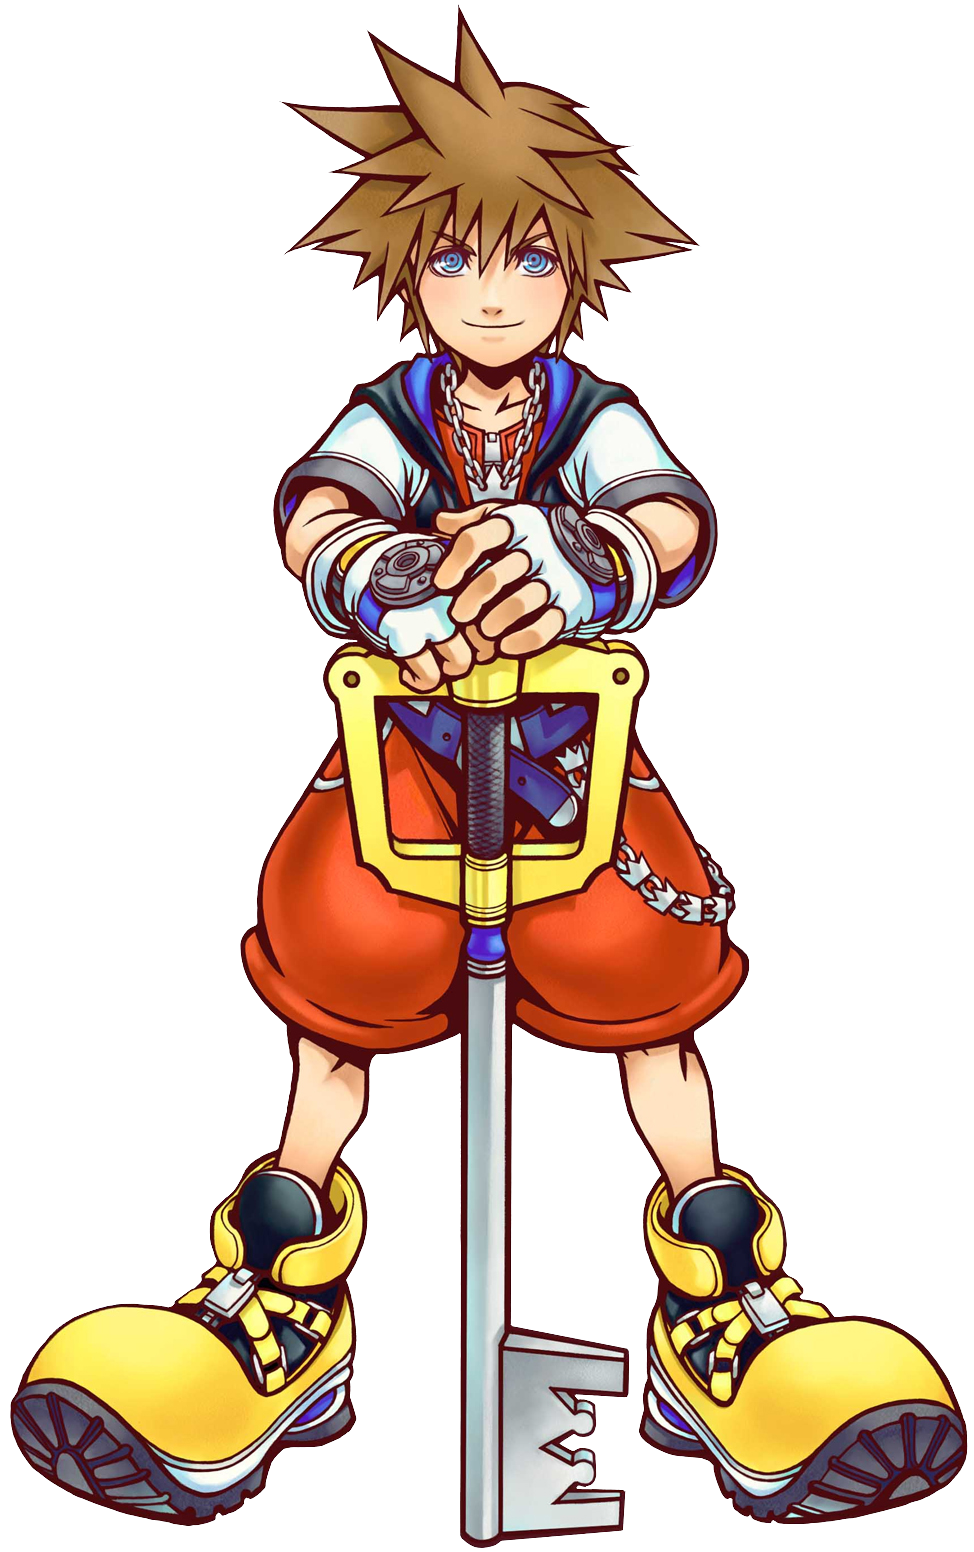 Sora   Deadliest Fiction Wiki   FANDOM powered by Wikia